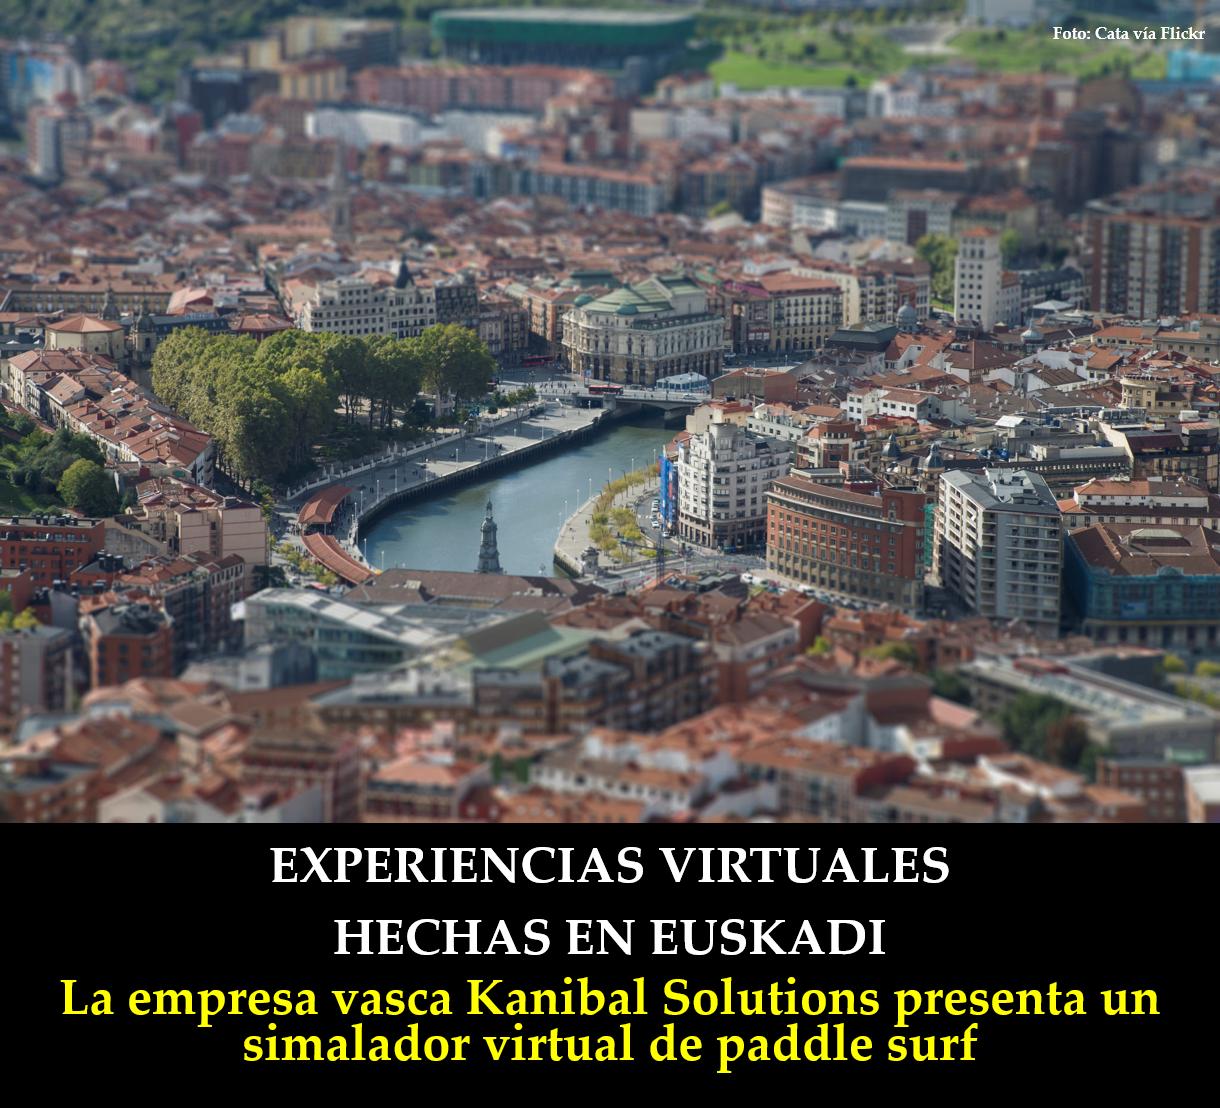 Experiencias virtuales hechas en euskadi infopost